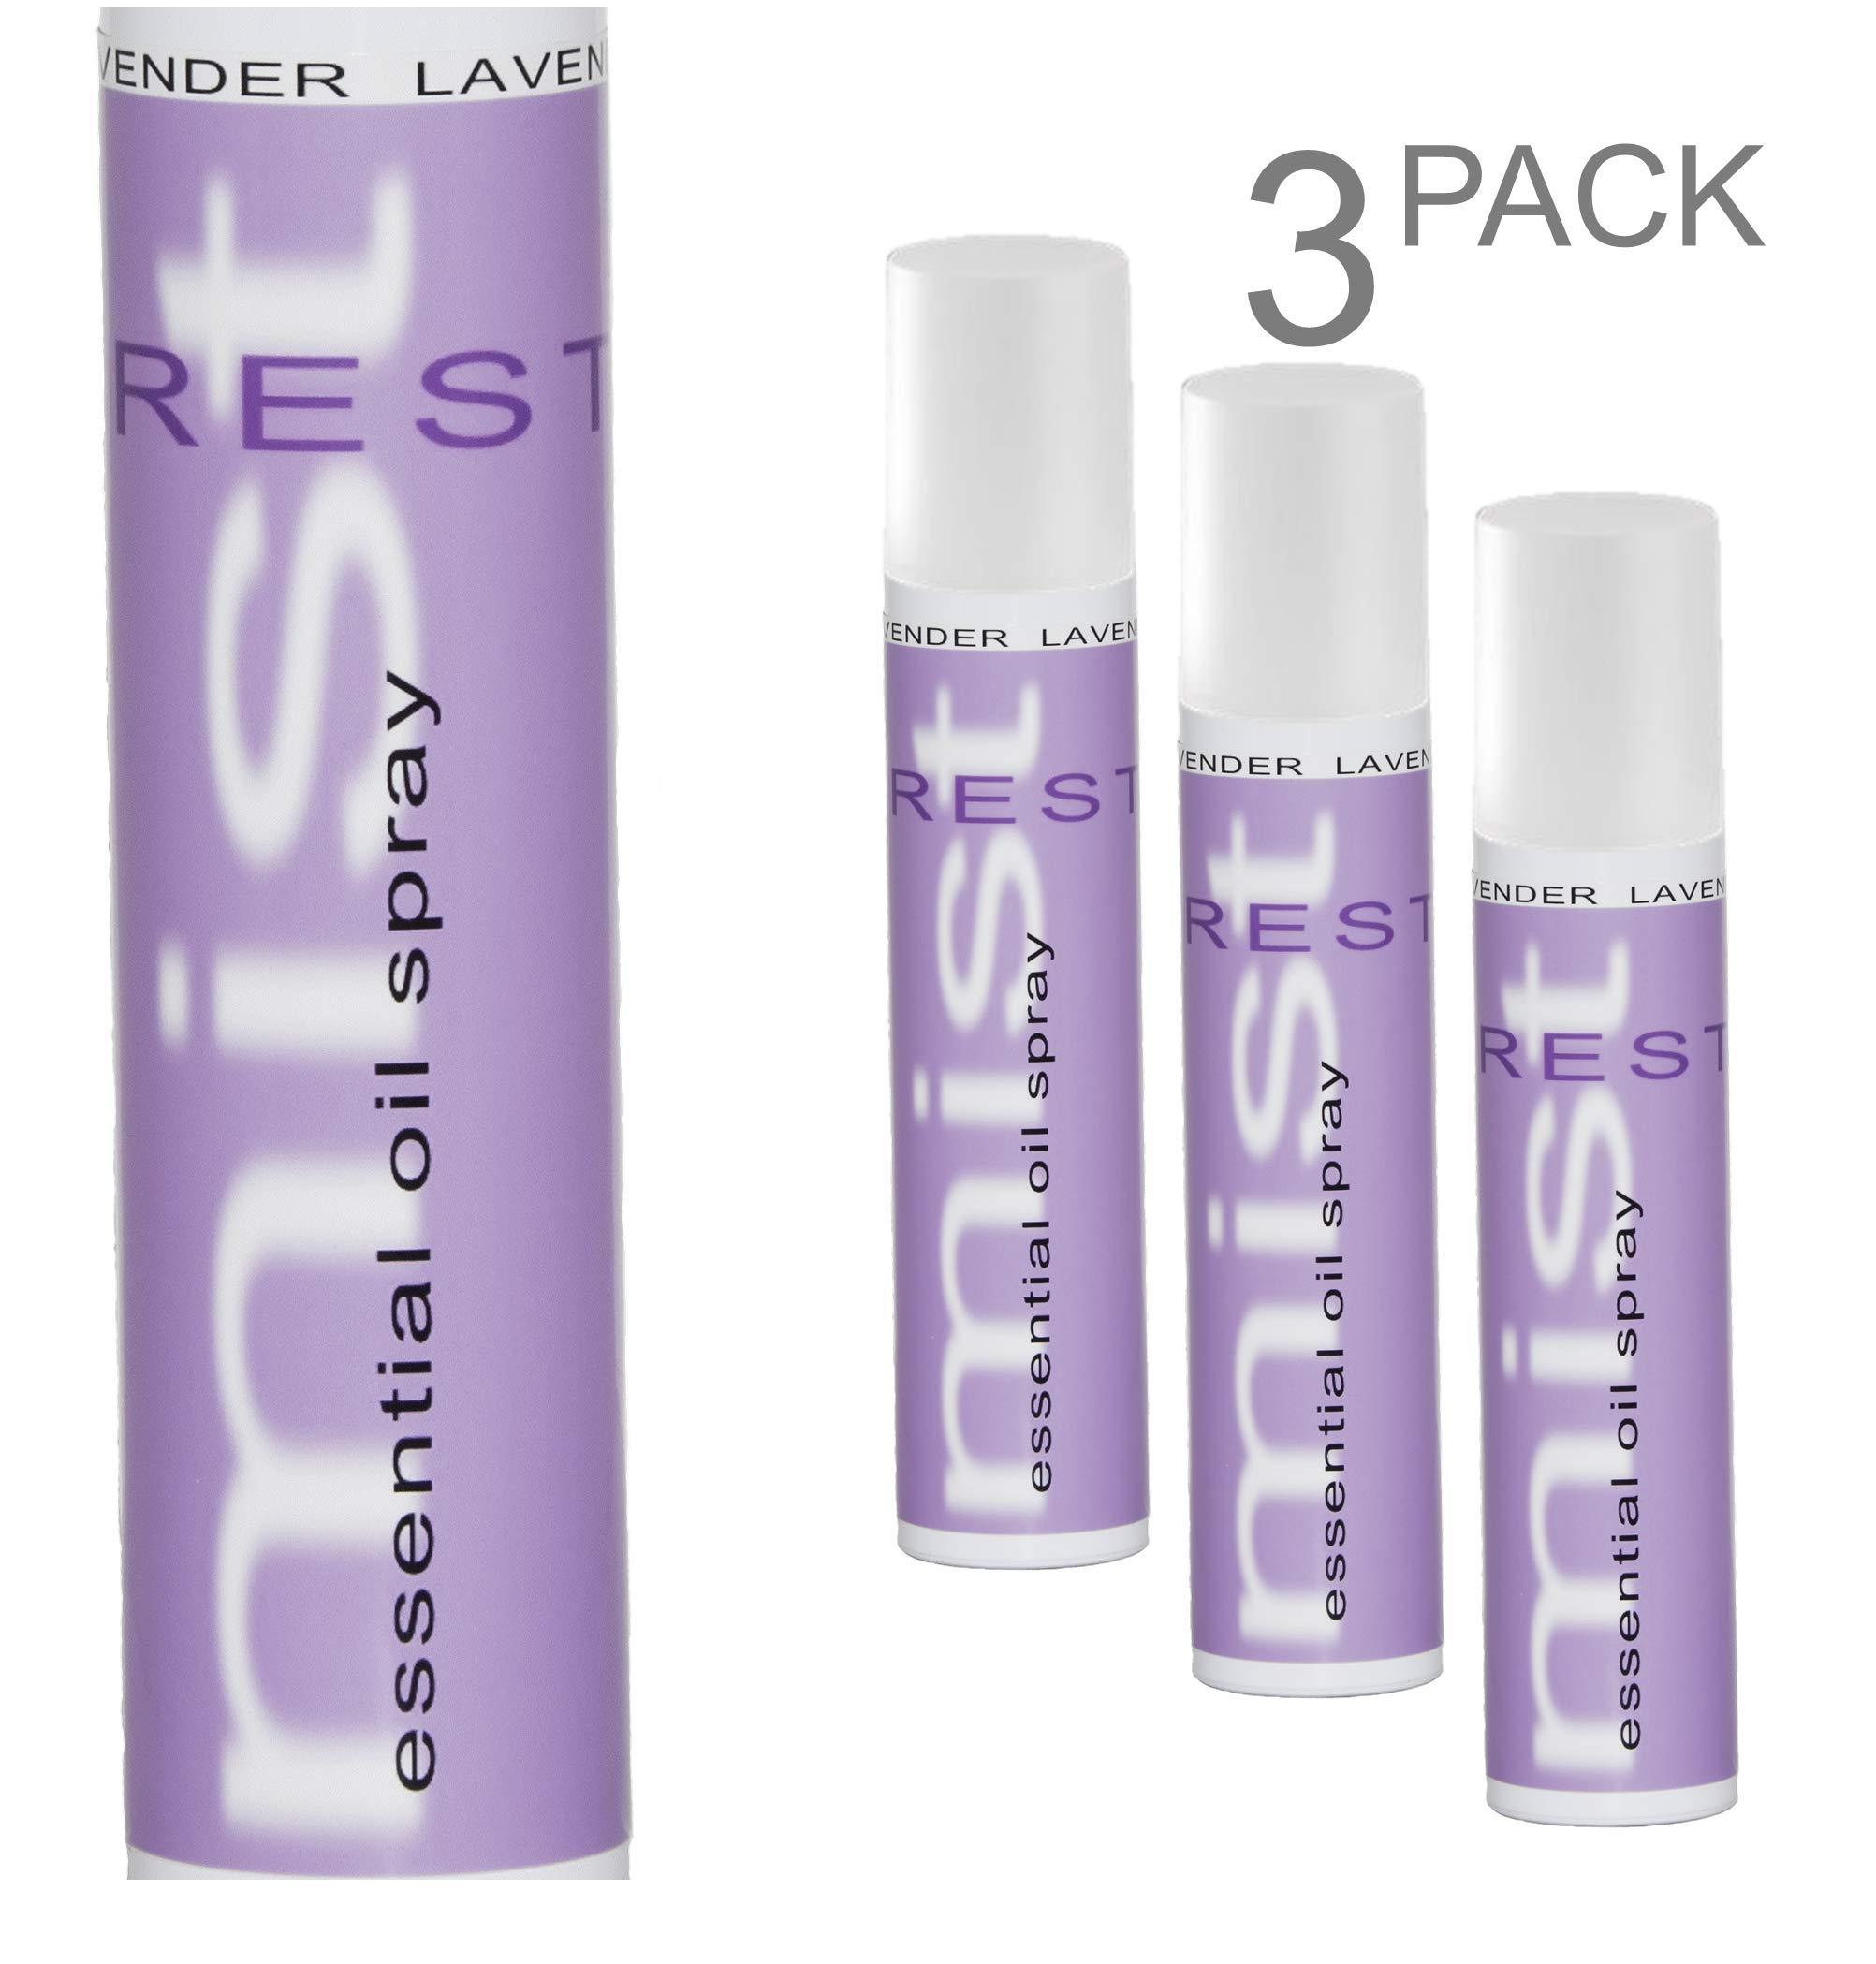 Mist Essential Oils (3 Pack Lavender)- Contains Pure Lavender Essential Oil, Natural Bathroom air freshener, Lavender Room Spray, Linen Spray, Fabric Spray, Room Spray air freshener, Pillow Spray. by Mist Essential Oil Spray